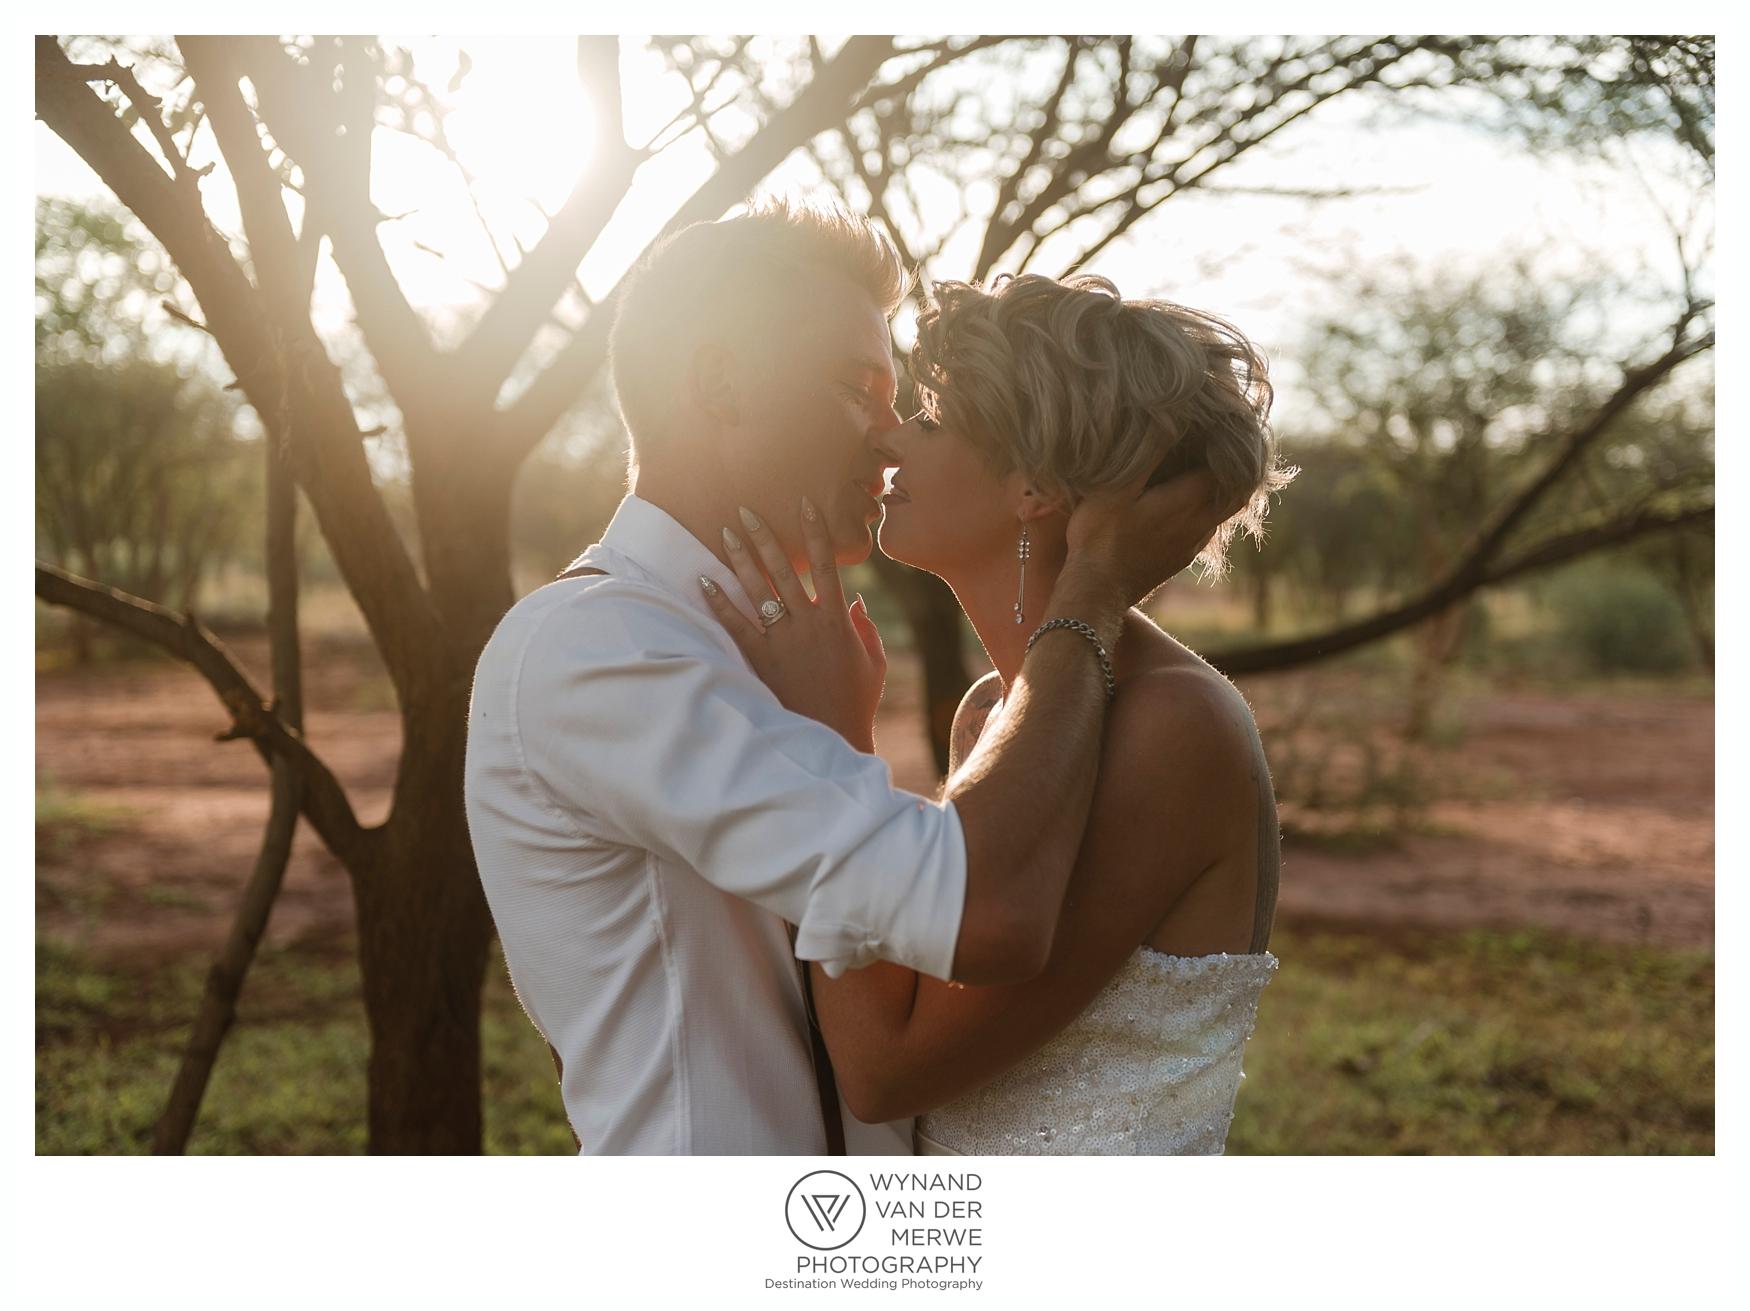 WynandvanderMerwe_weddingphotography_bushveldwedding_northam_bushveld_limpopowedding_limpopo_southafrica-232.jpg